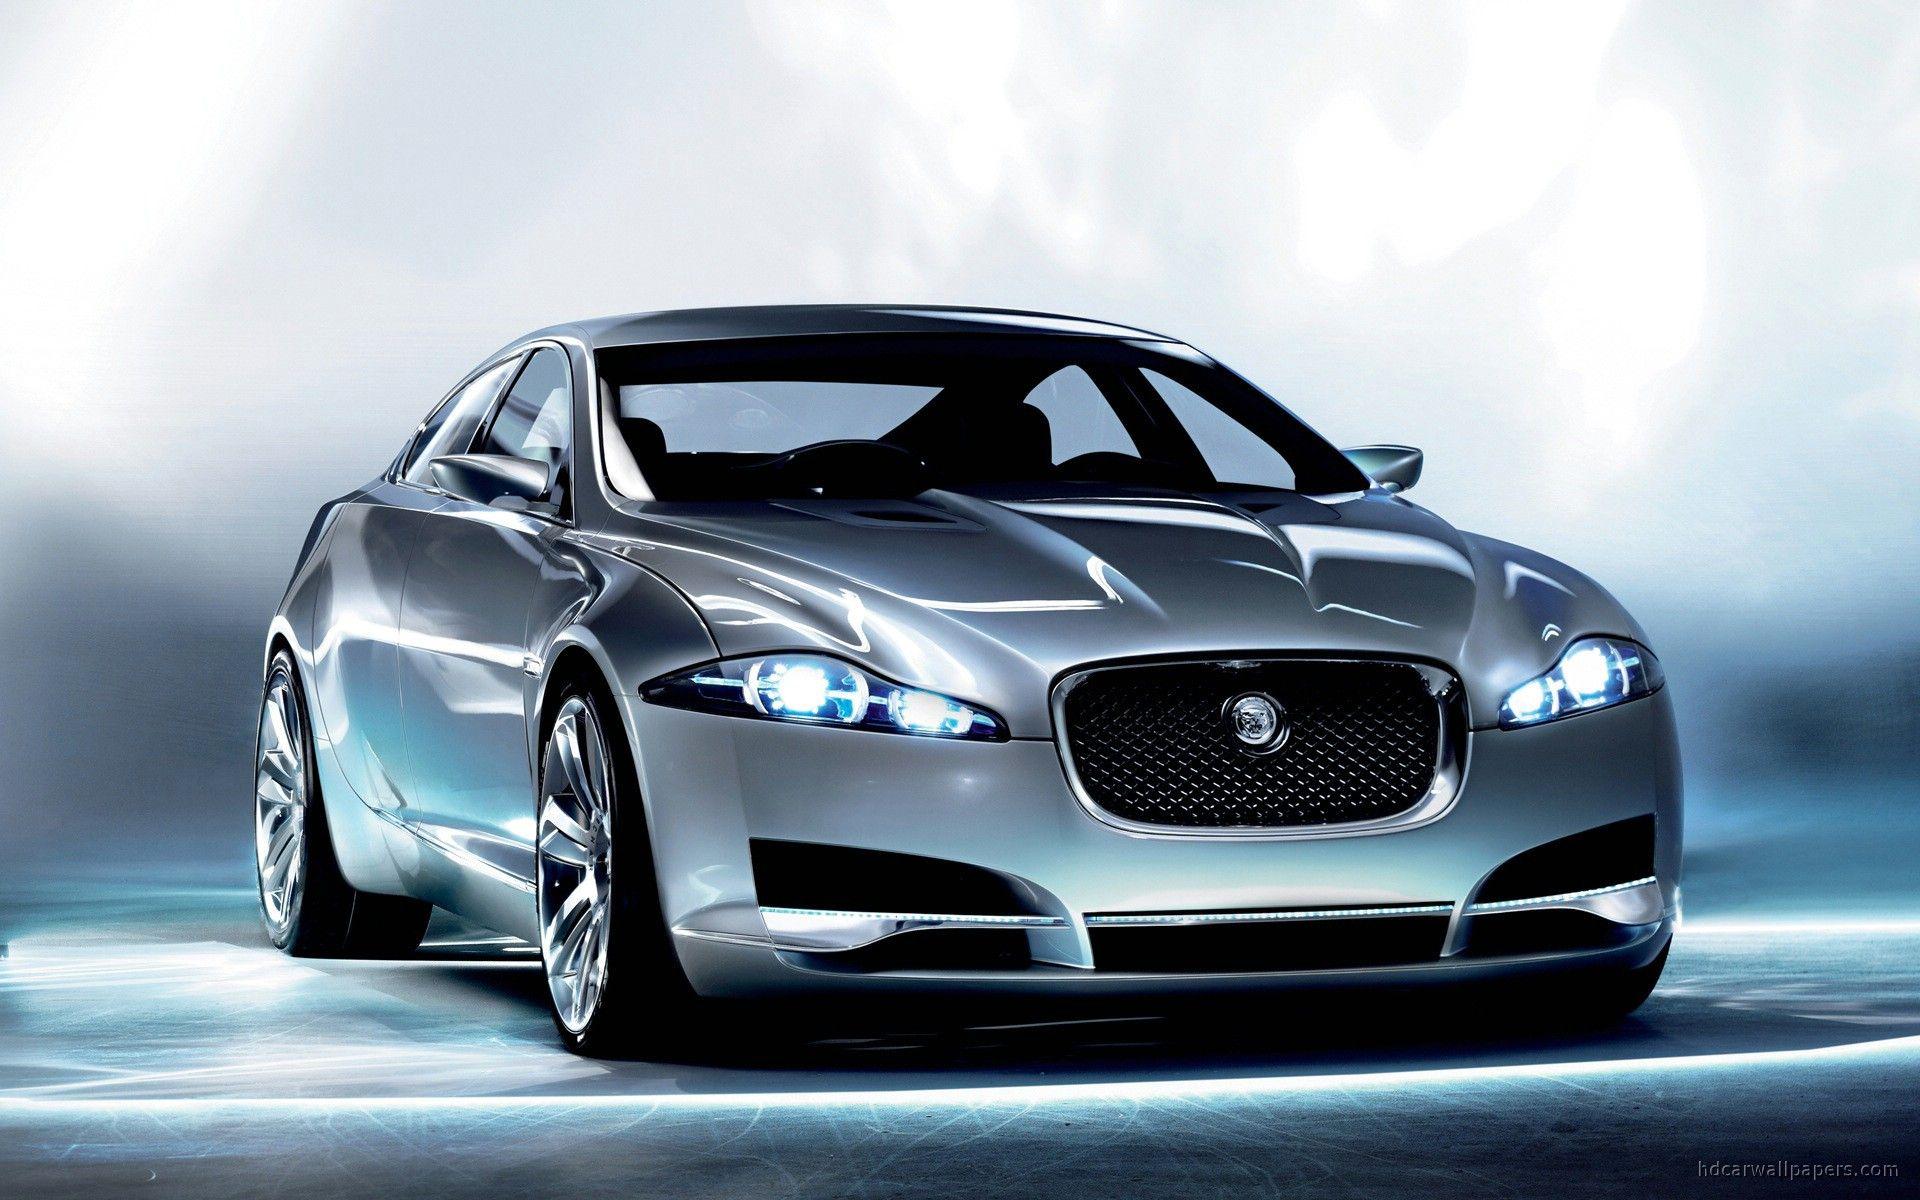 Jaguar C Xf Concept Wallpaper Free Download Resolution 1920x1200 Px